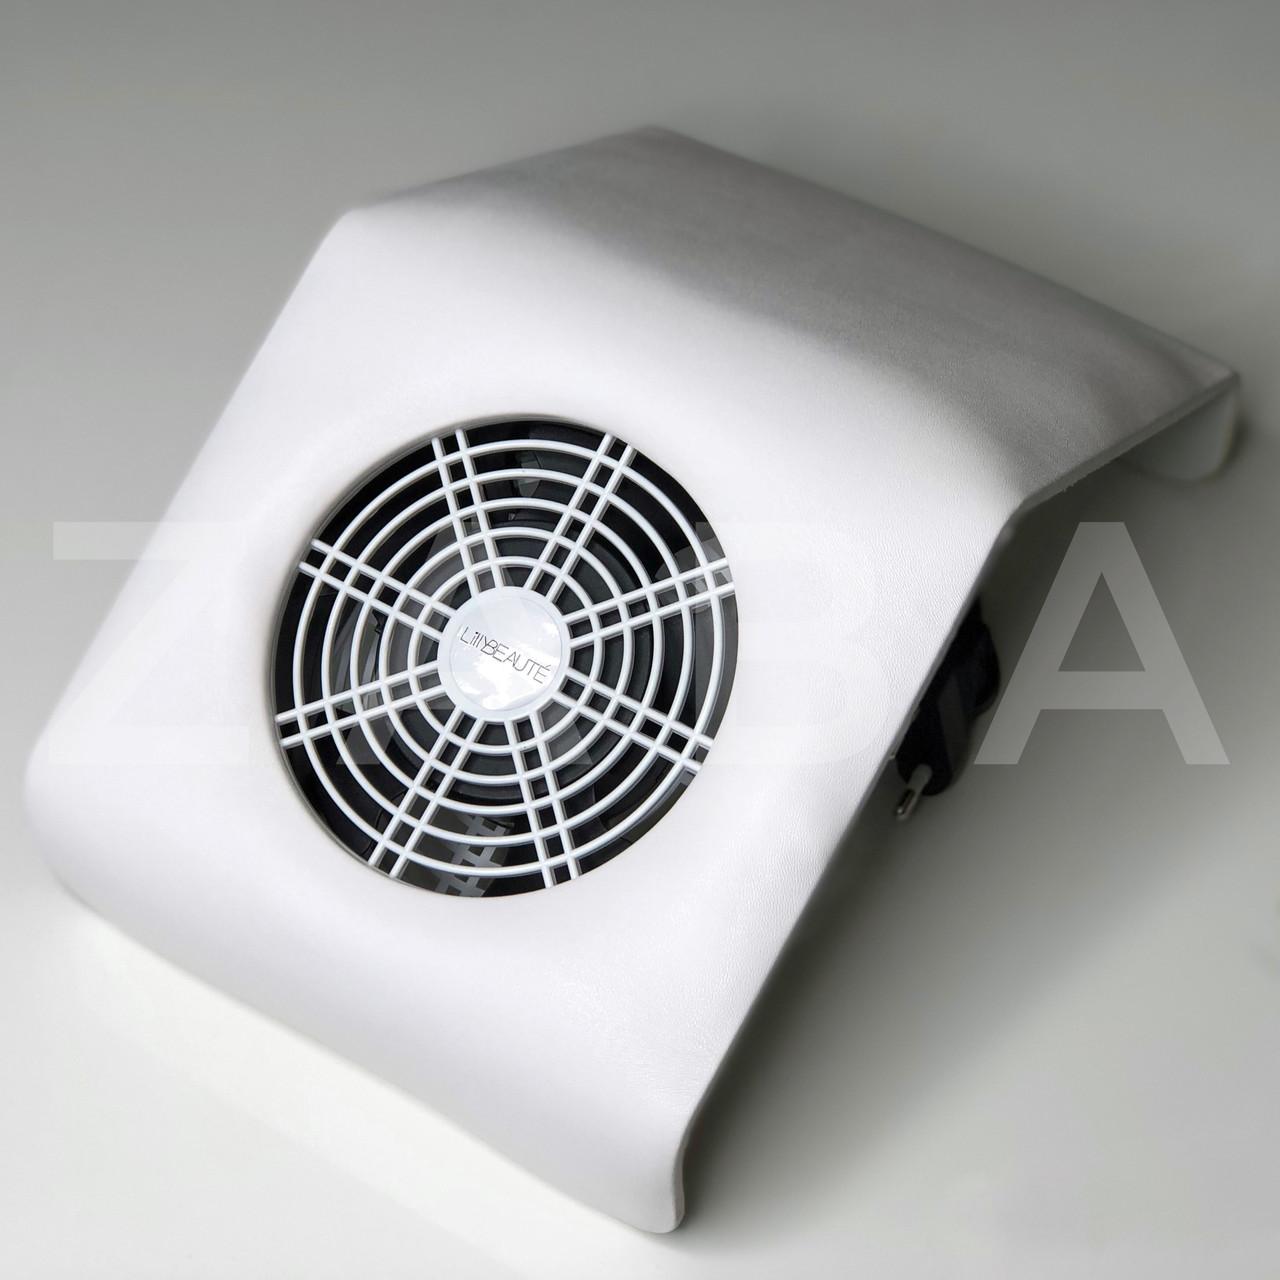 Настольная вытяжка (пылесос) Nail Dust Collector на 30 Вт, белая